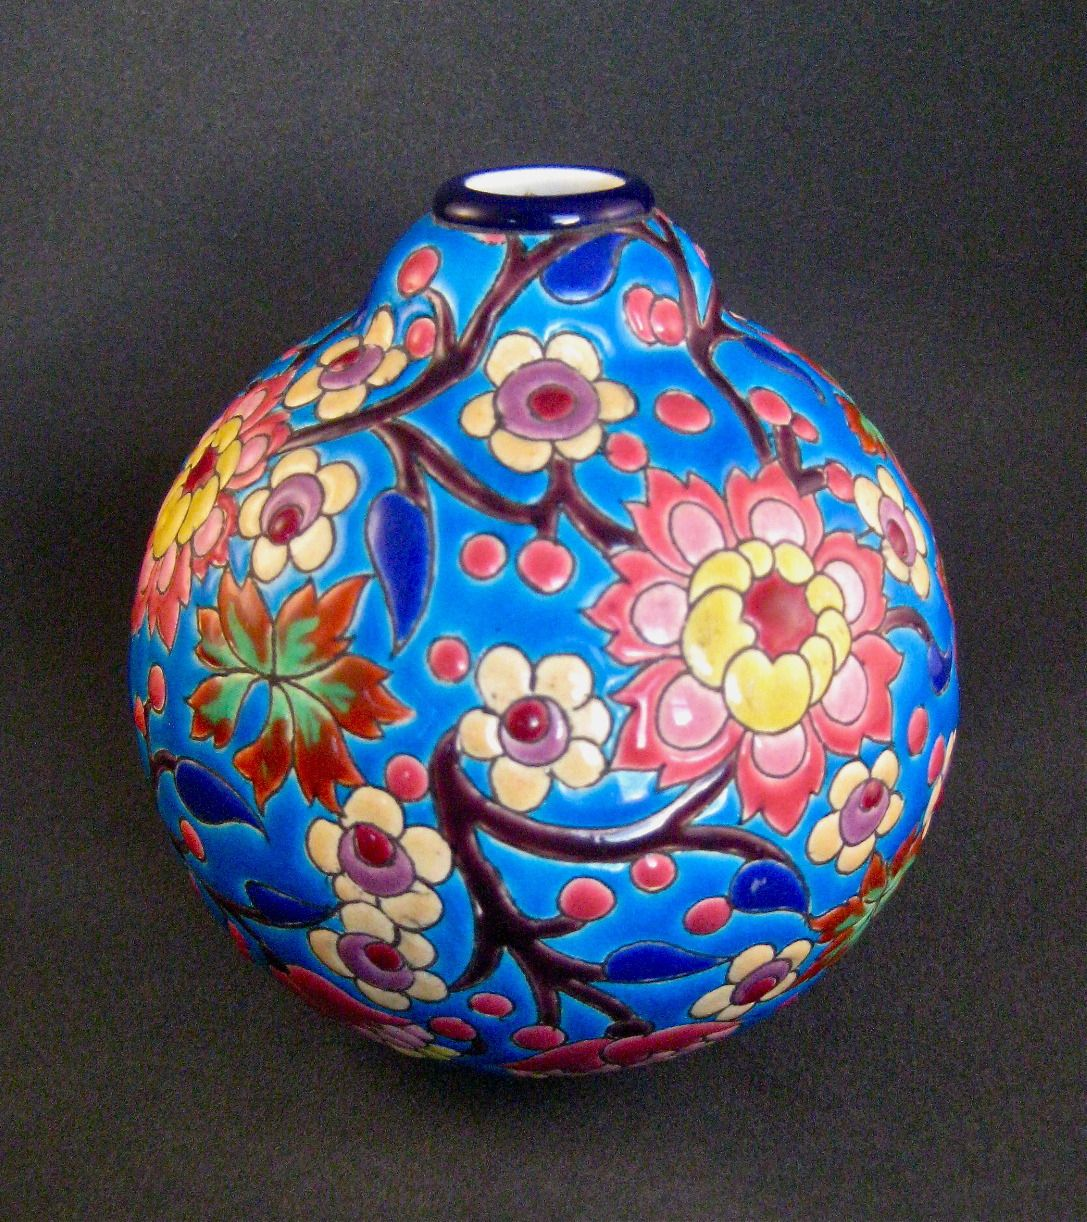 Emaux de longwy art pottery ball vase france c 1935 pottery emaux de longwy art pottery ball vase france c 1935 reviewsmspy